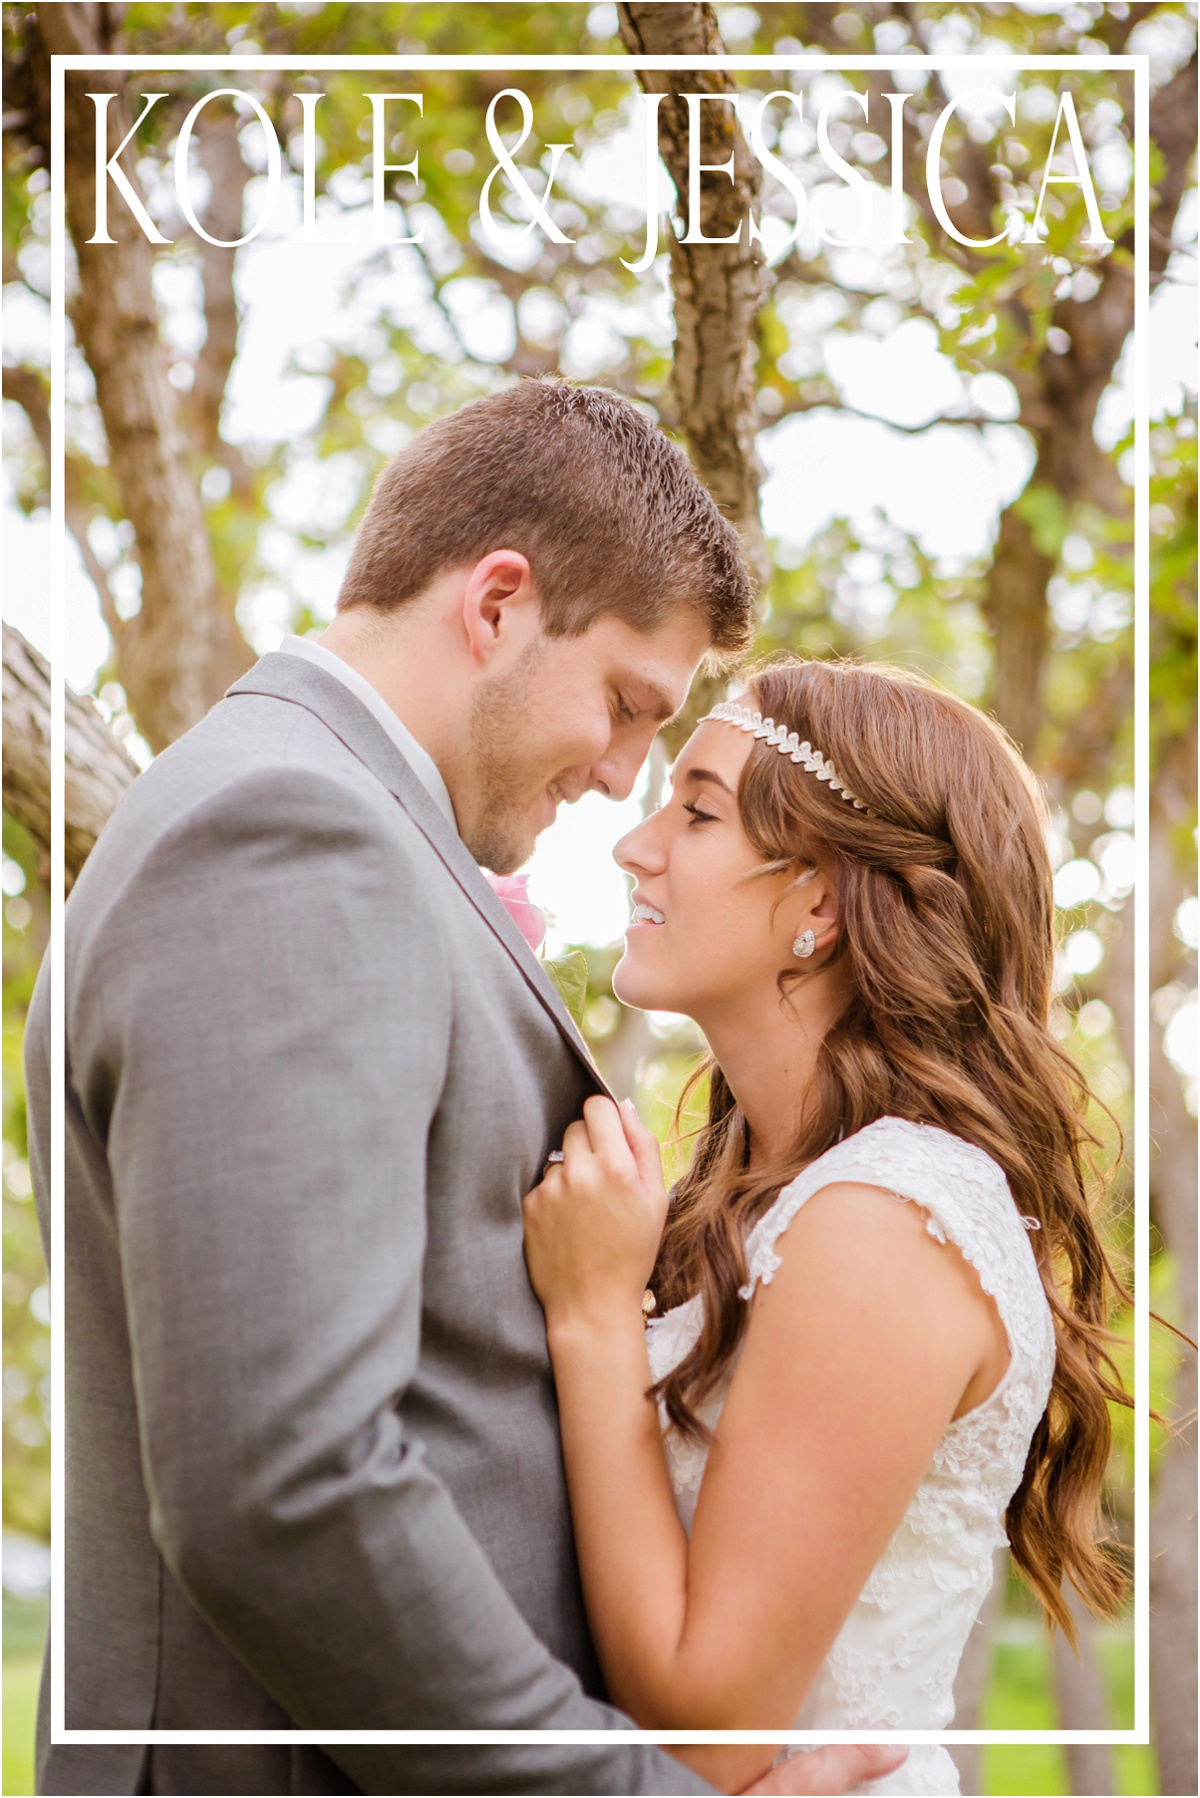 Terra Cooper Photography Weddings Brides 2015_5372.jpg